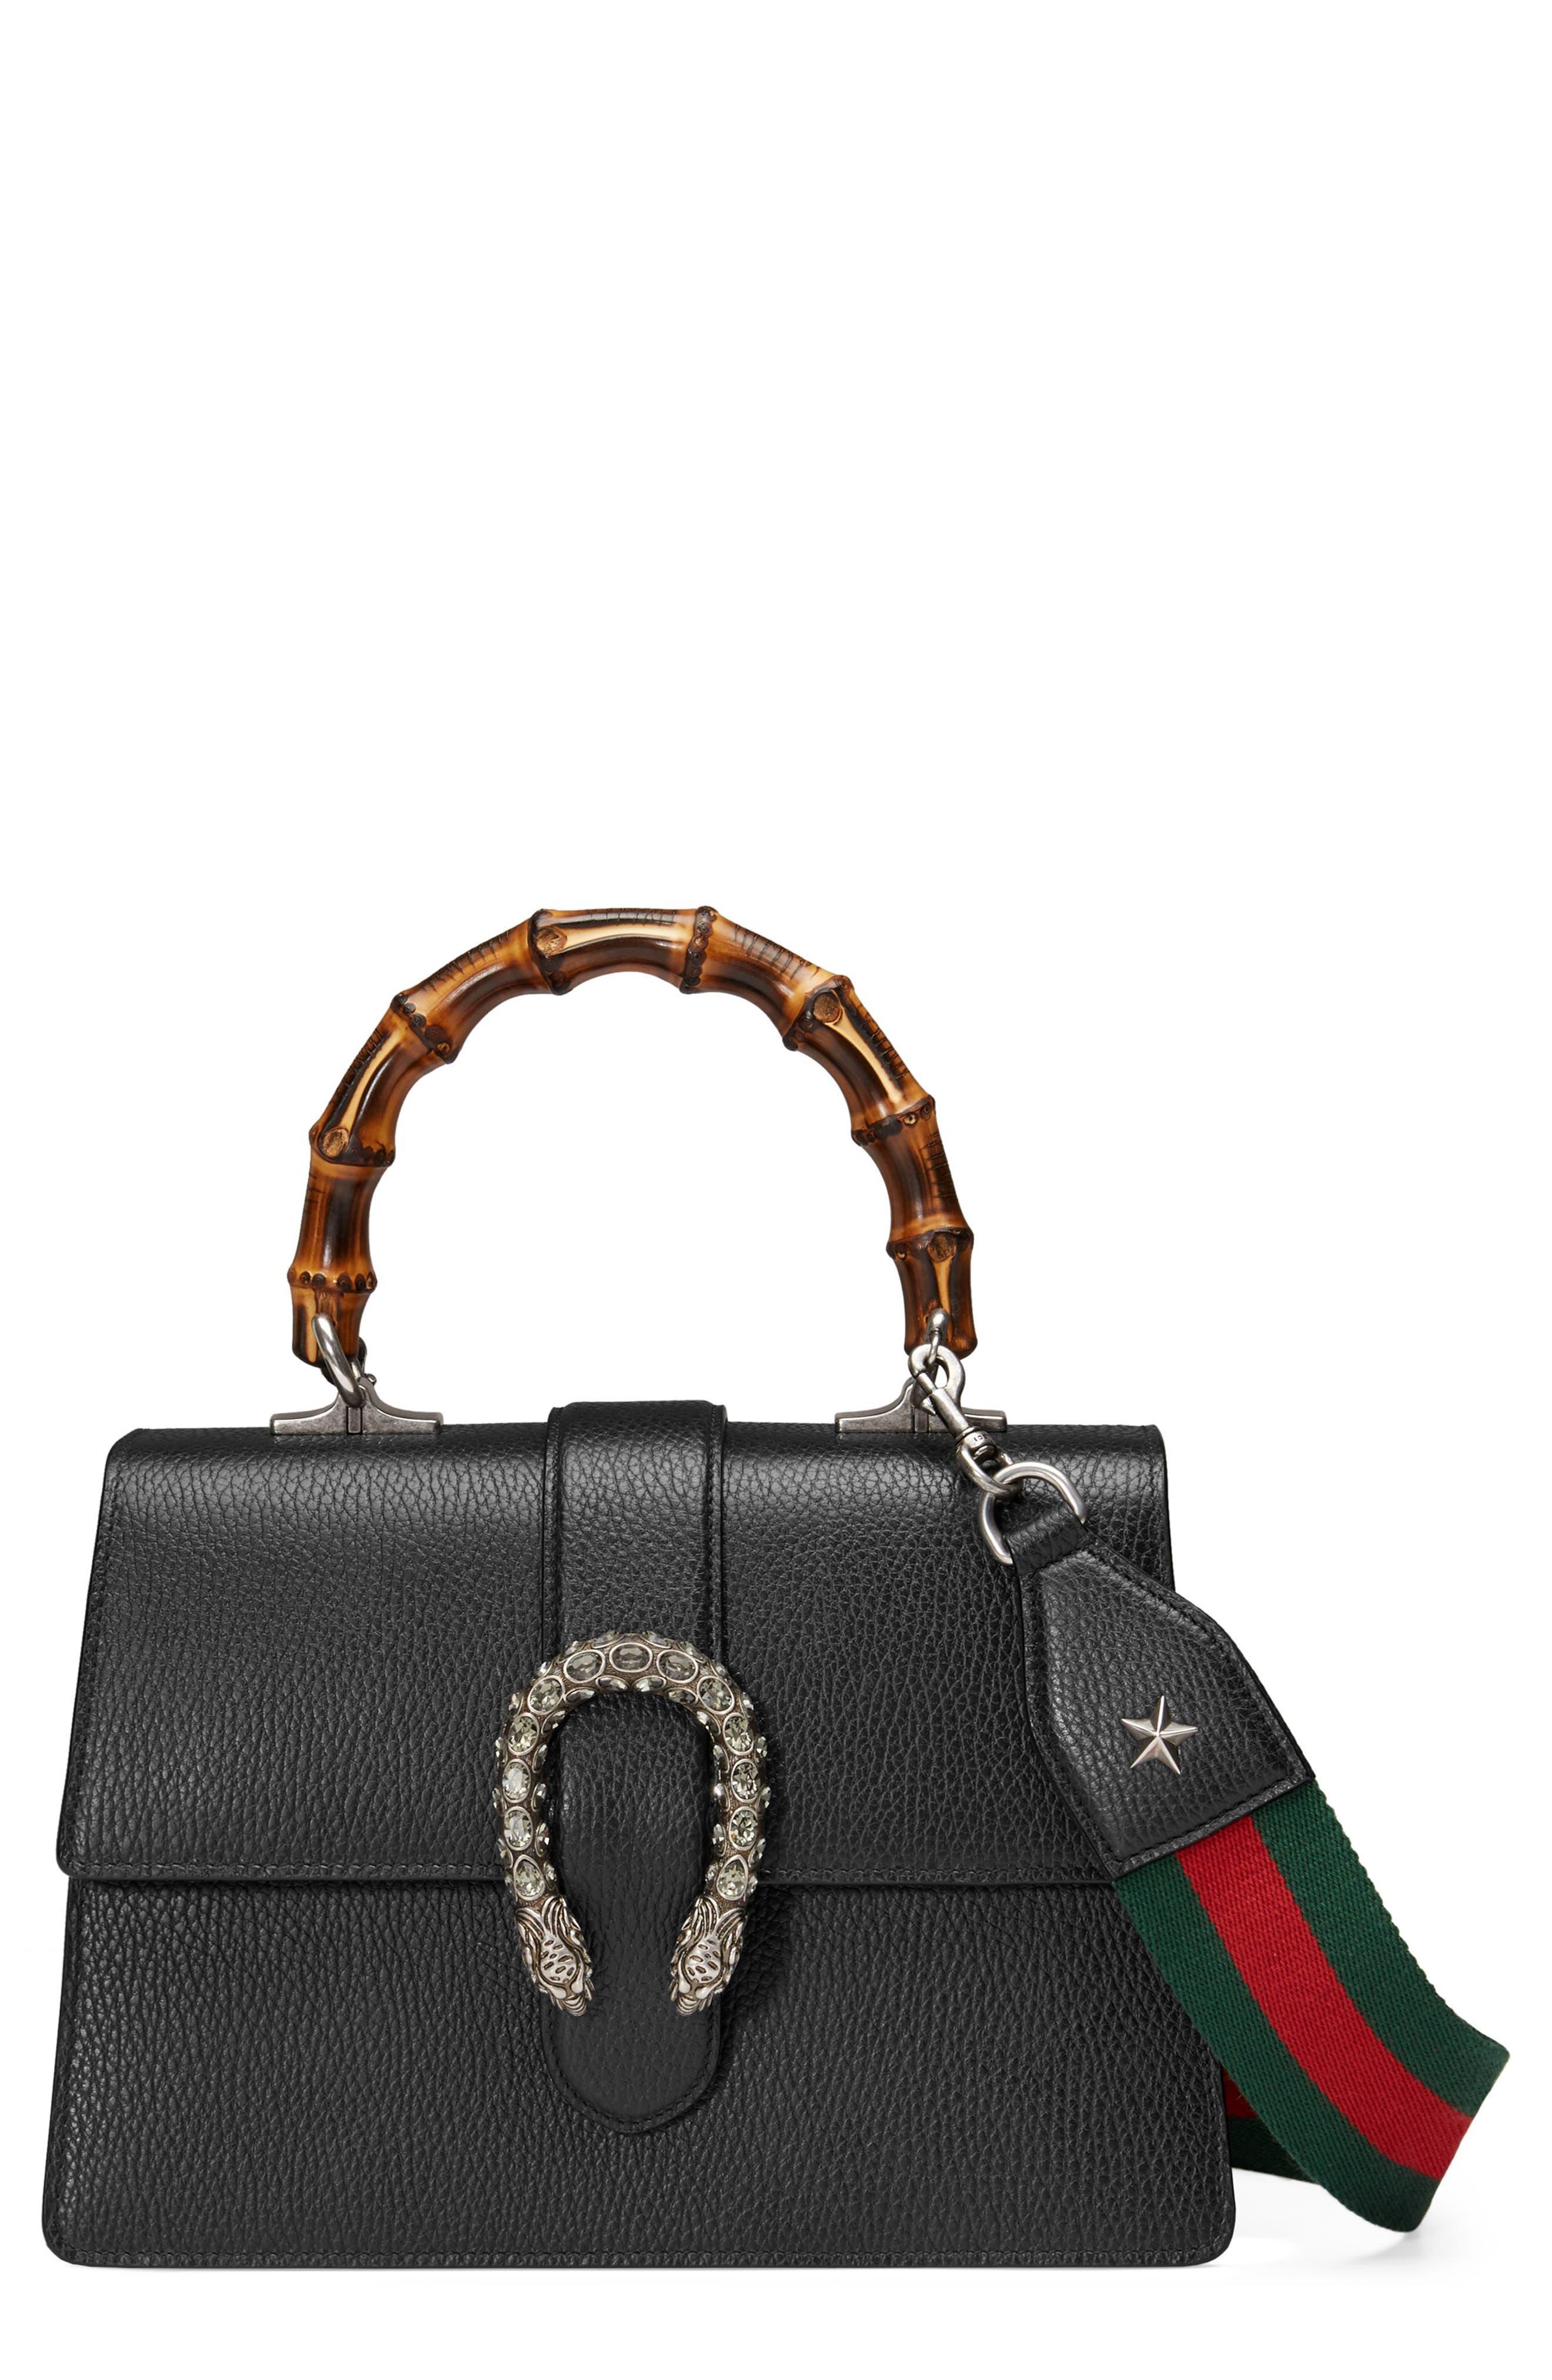 GUCCI Medium Dionysus Leather Top Handle Satchel, Main, color, NERO/ VRV/ BLACK DIAMOND